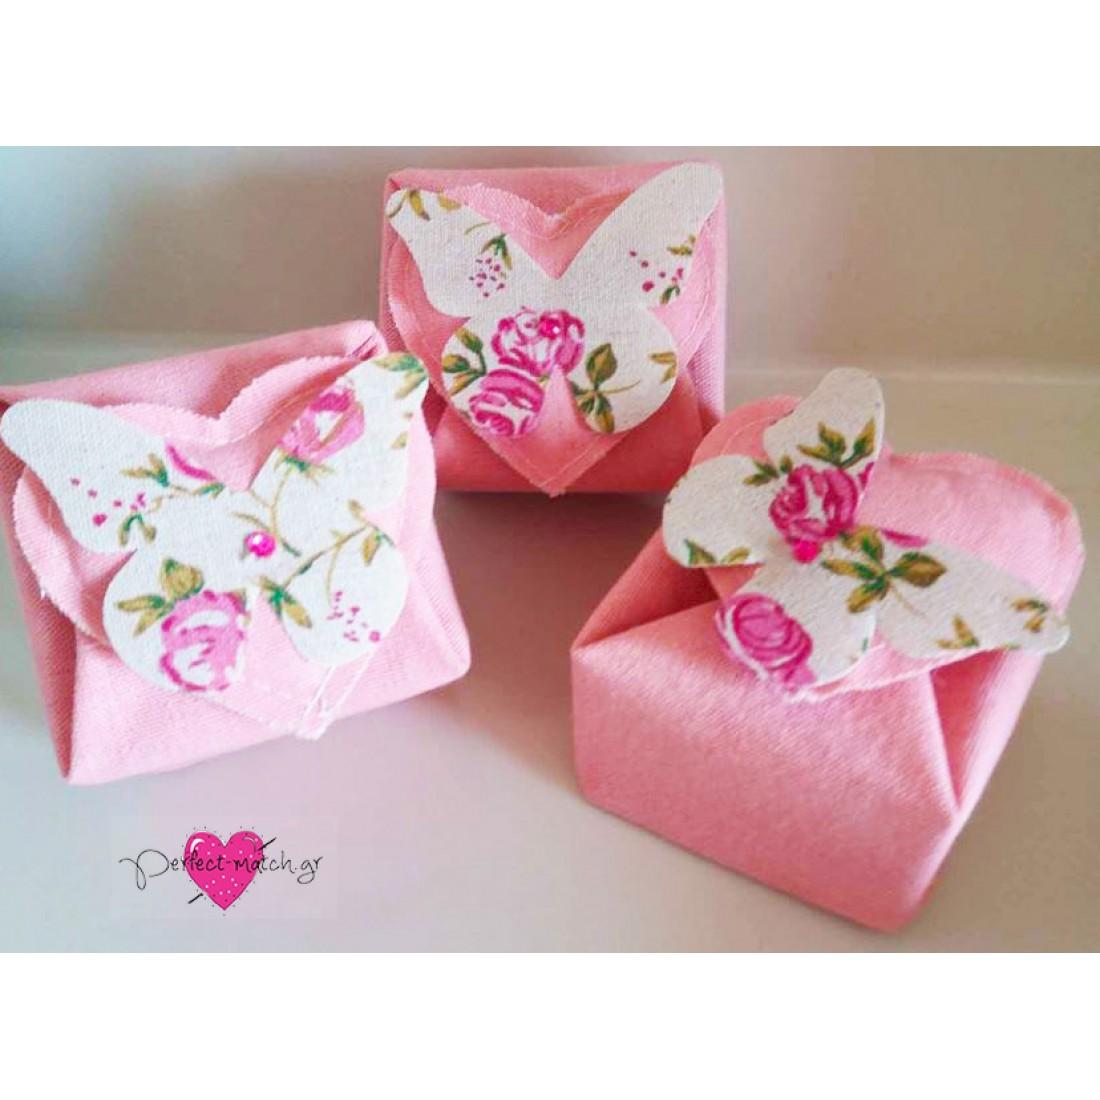 317265e57f Μπομπονιέρα Γάμου - Βάπτισης Λινό Κουτί με Floral Πεταλούδα